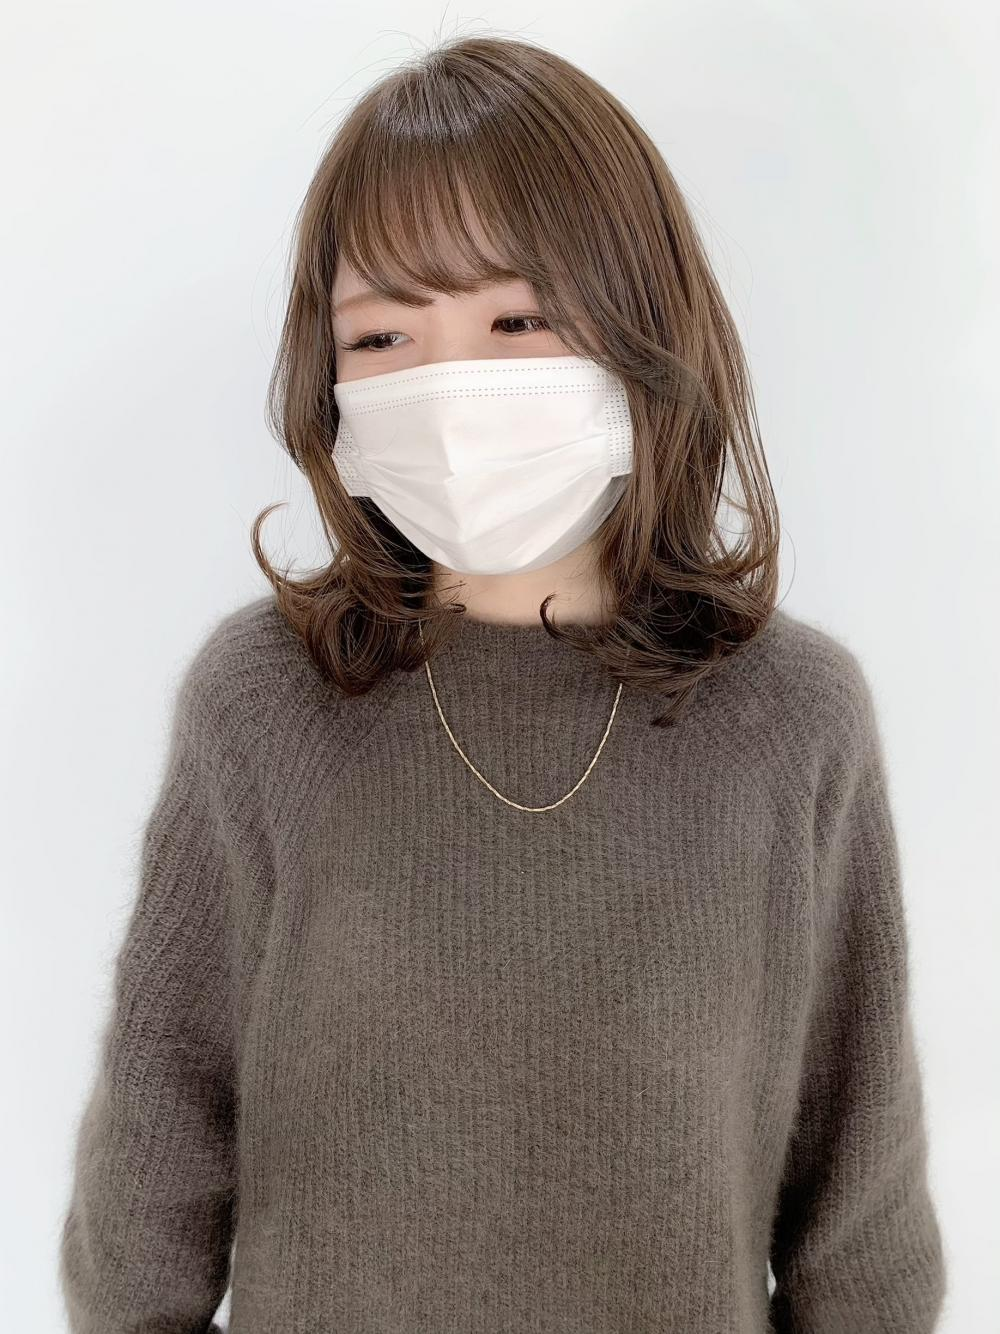 【feliceMICHI佐藤夏美】ミルクティーゆるレイヤー